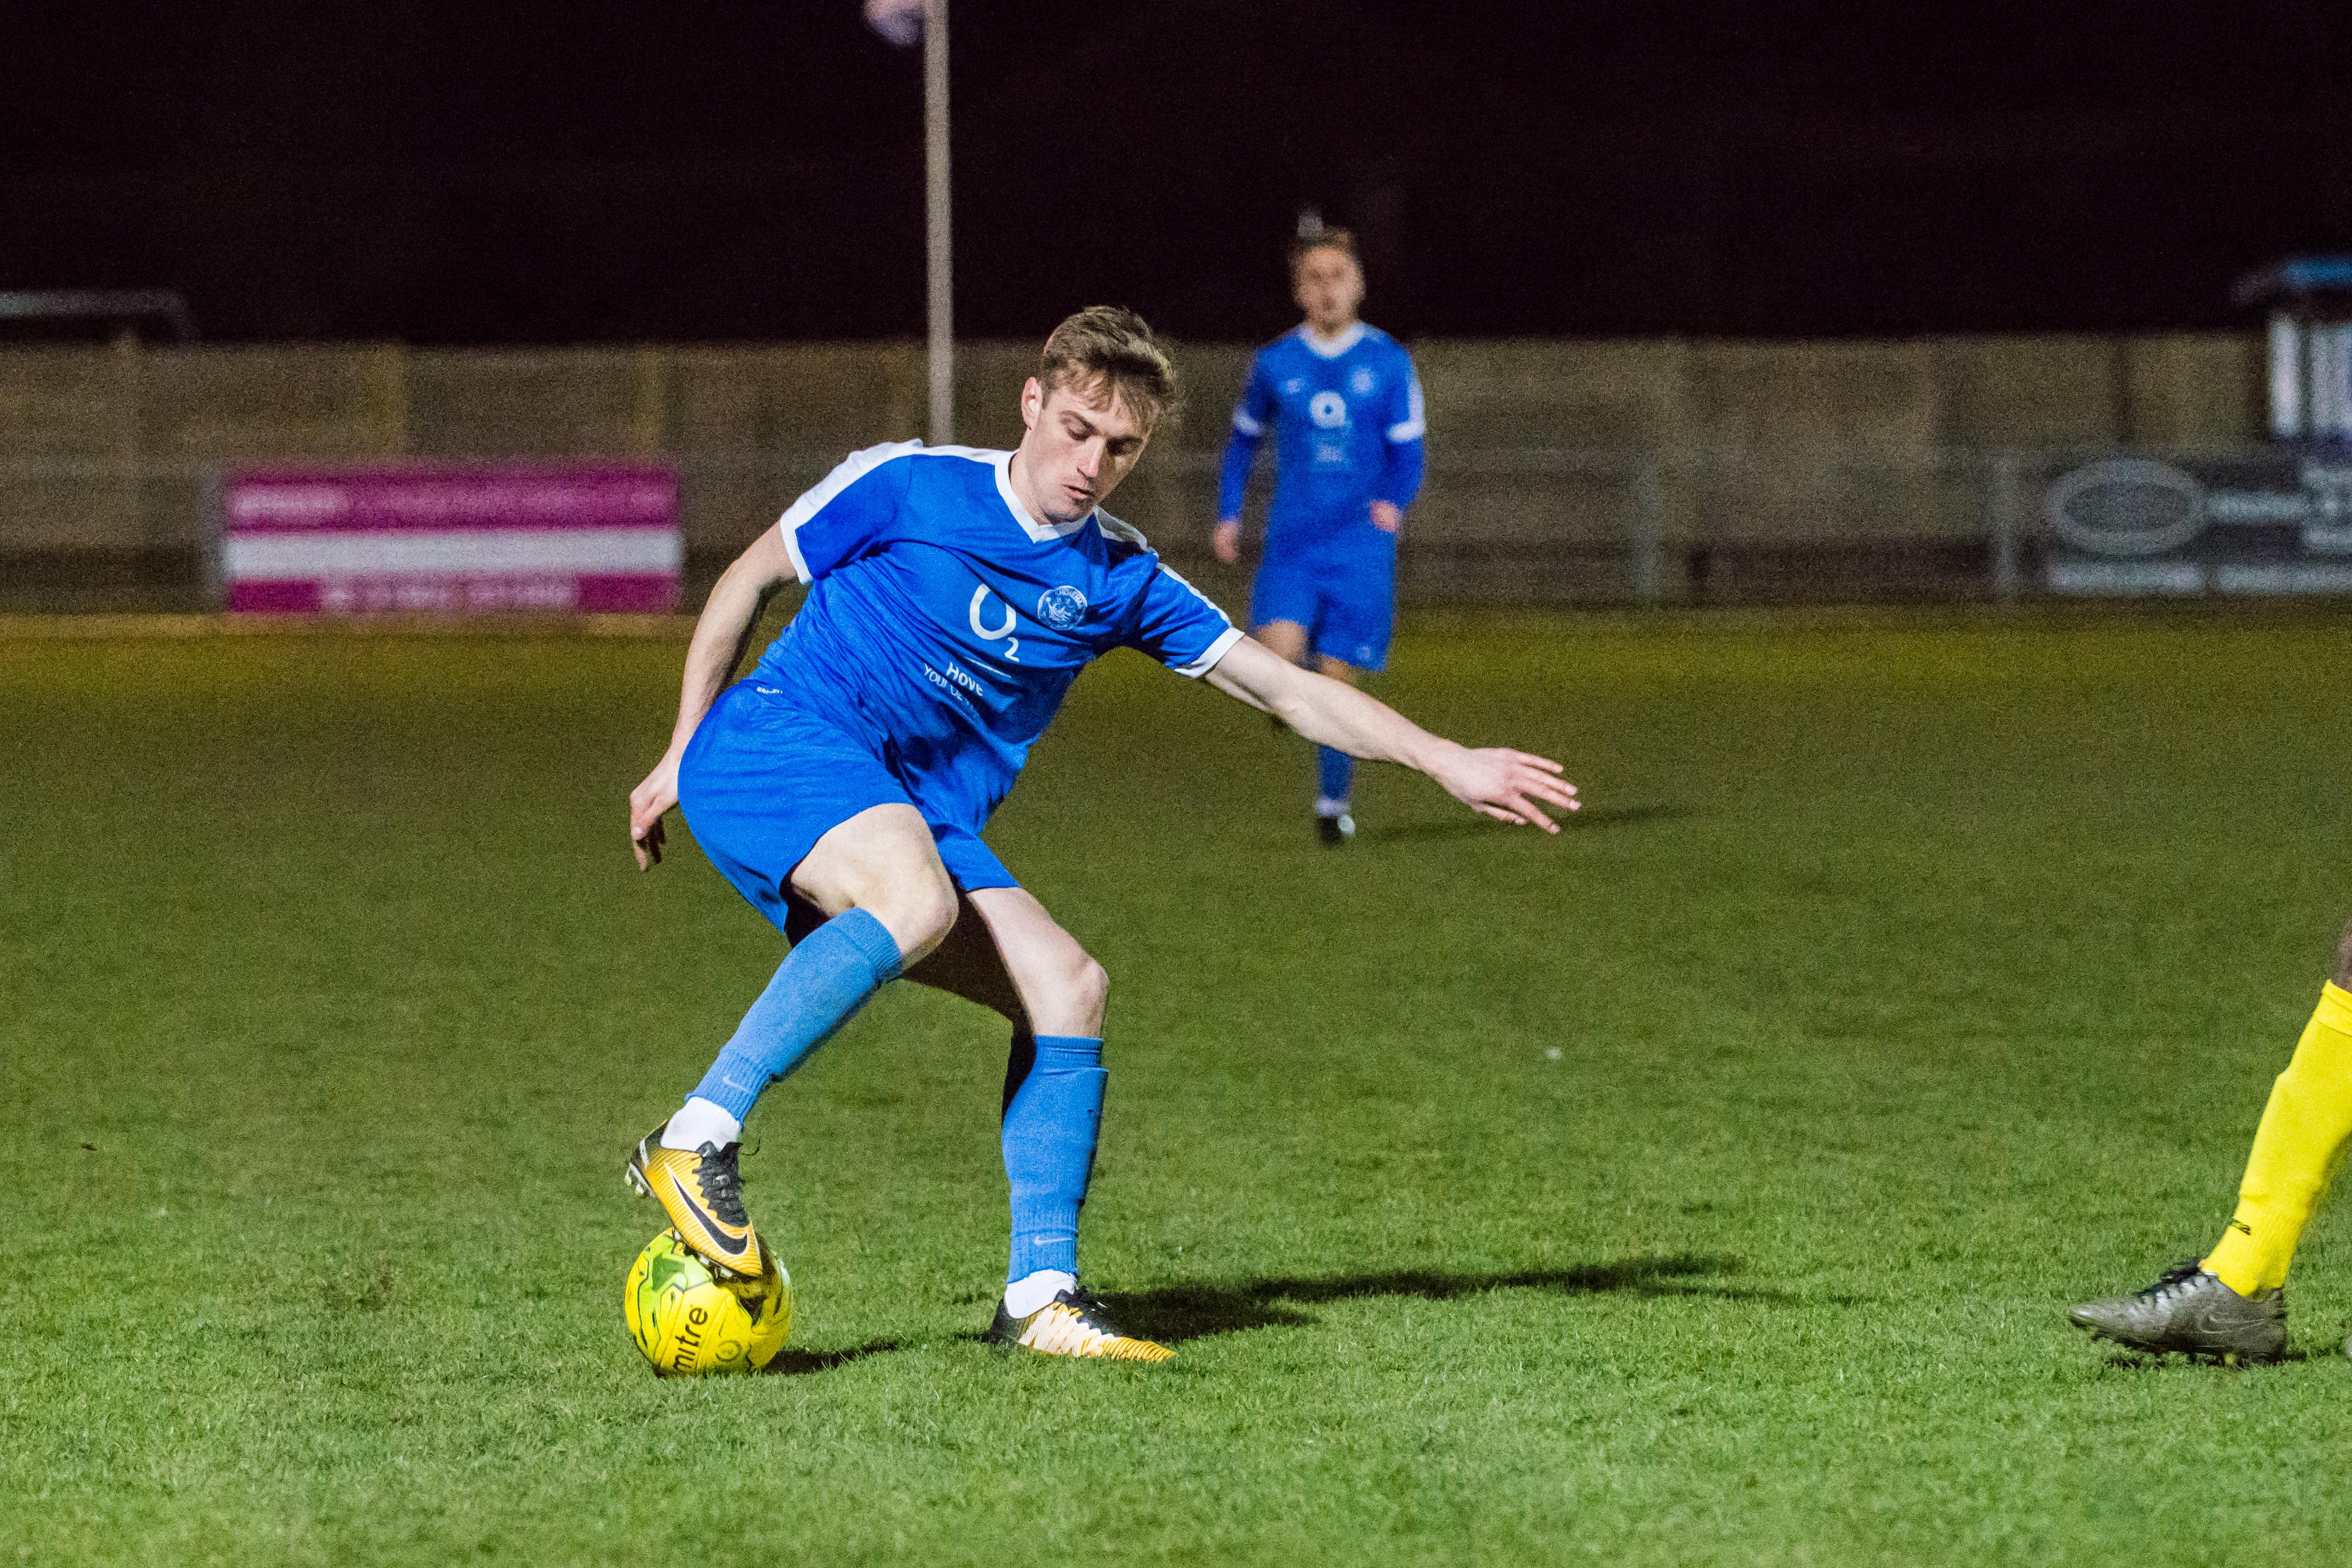 DAVID_JEFFERY Shoreham FC U18s vs Woking FC Academy 22.03.18 21